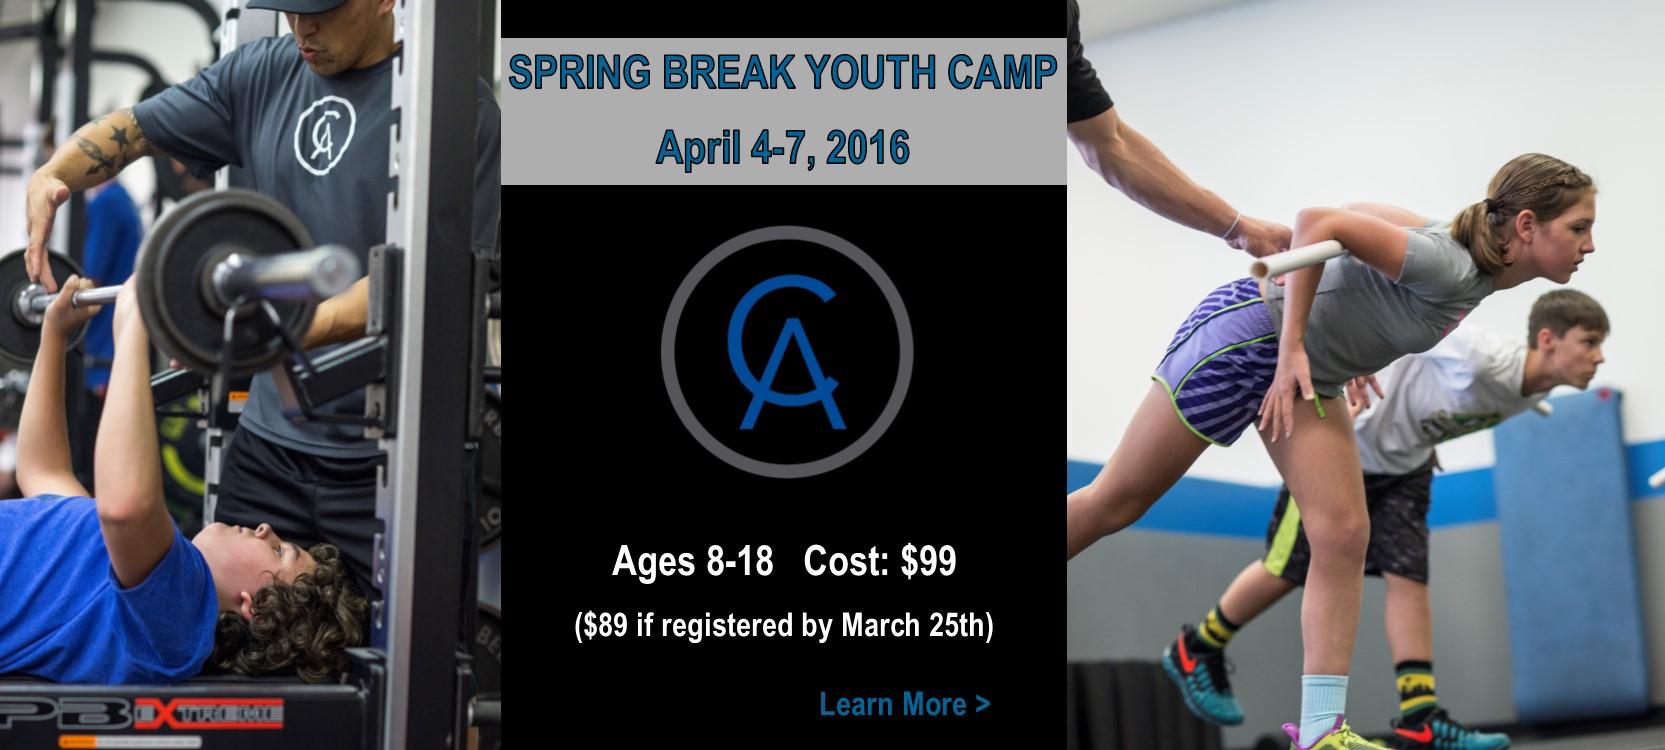 Spring Break Youth Camp Banner Image.jpg